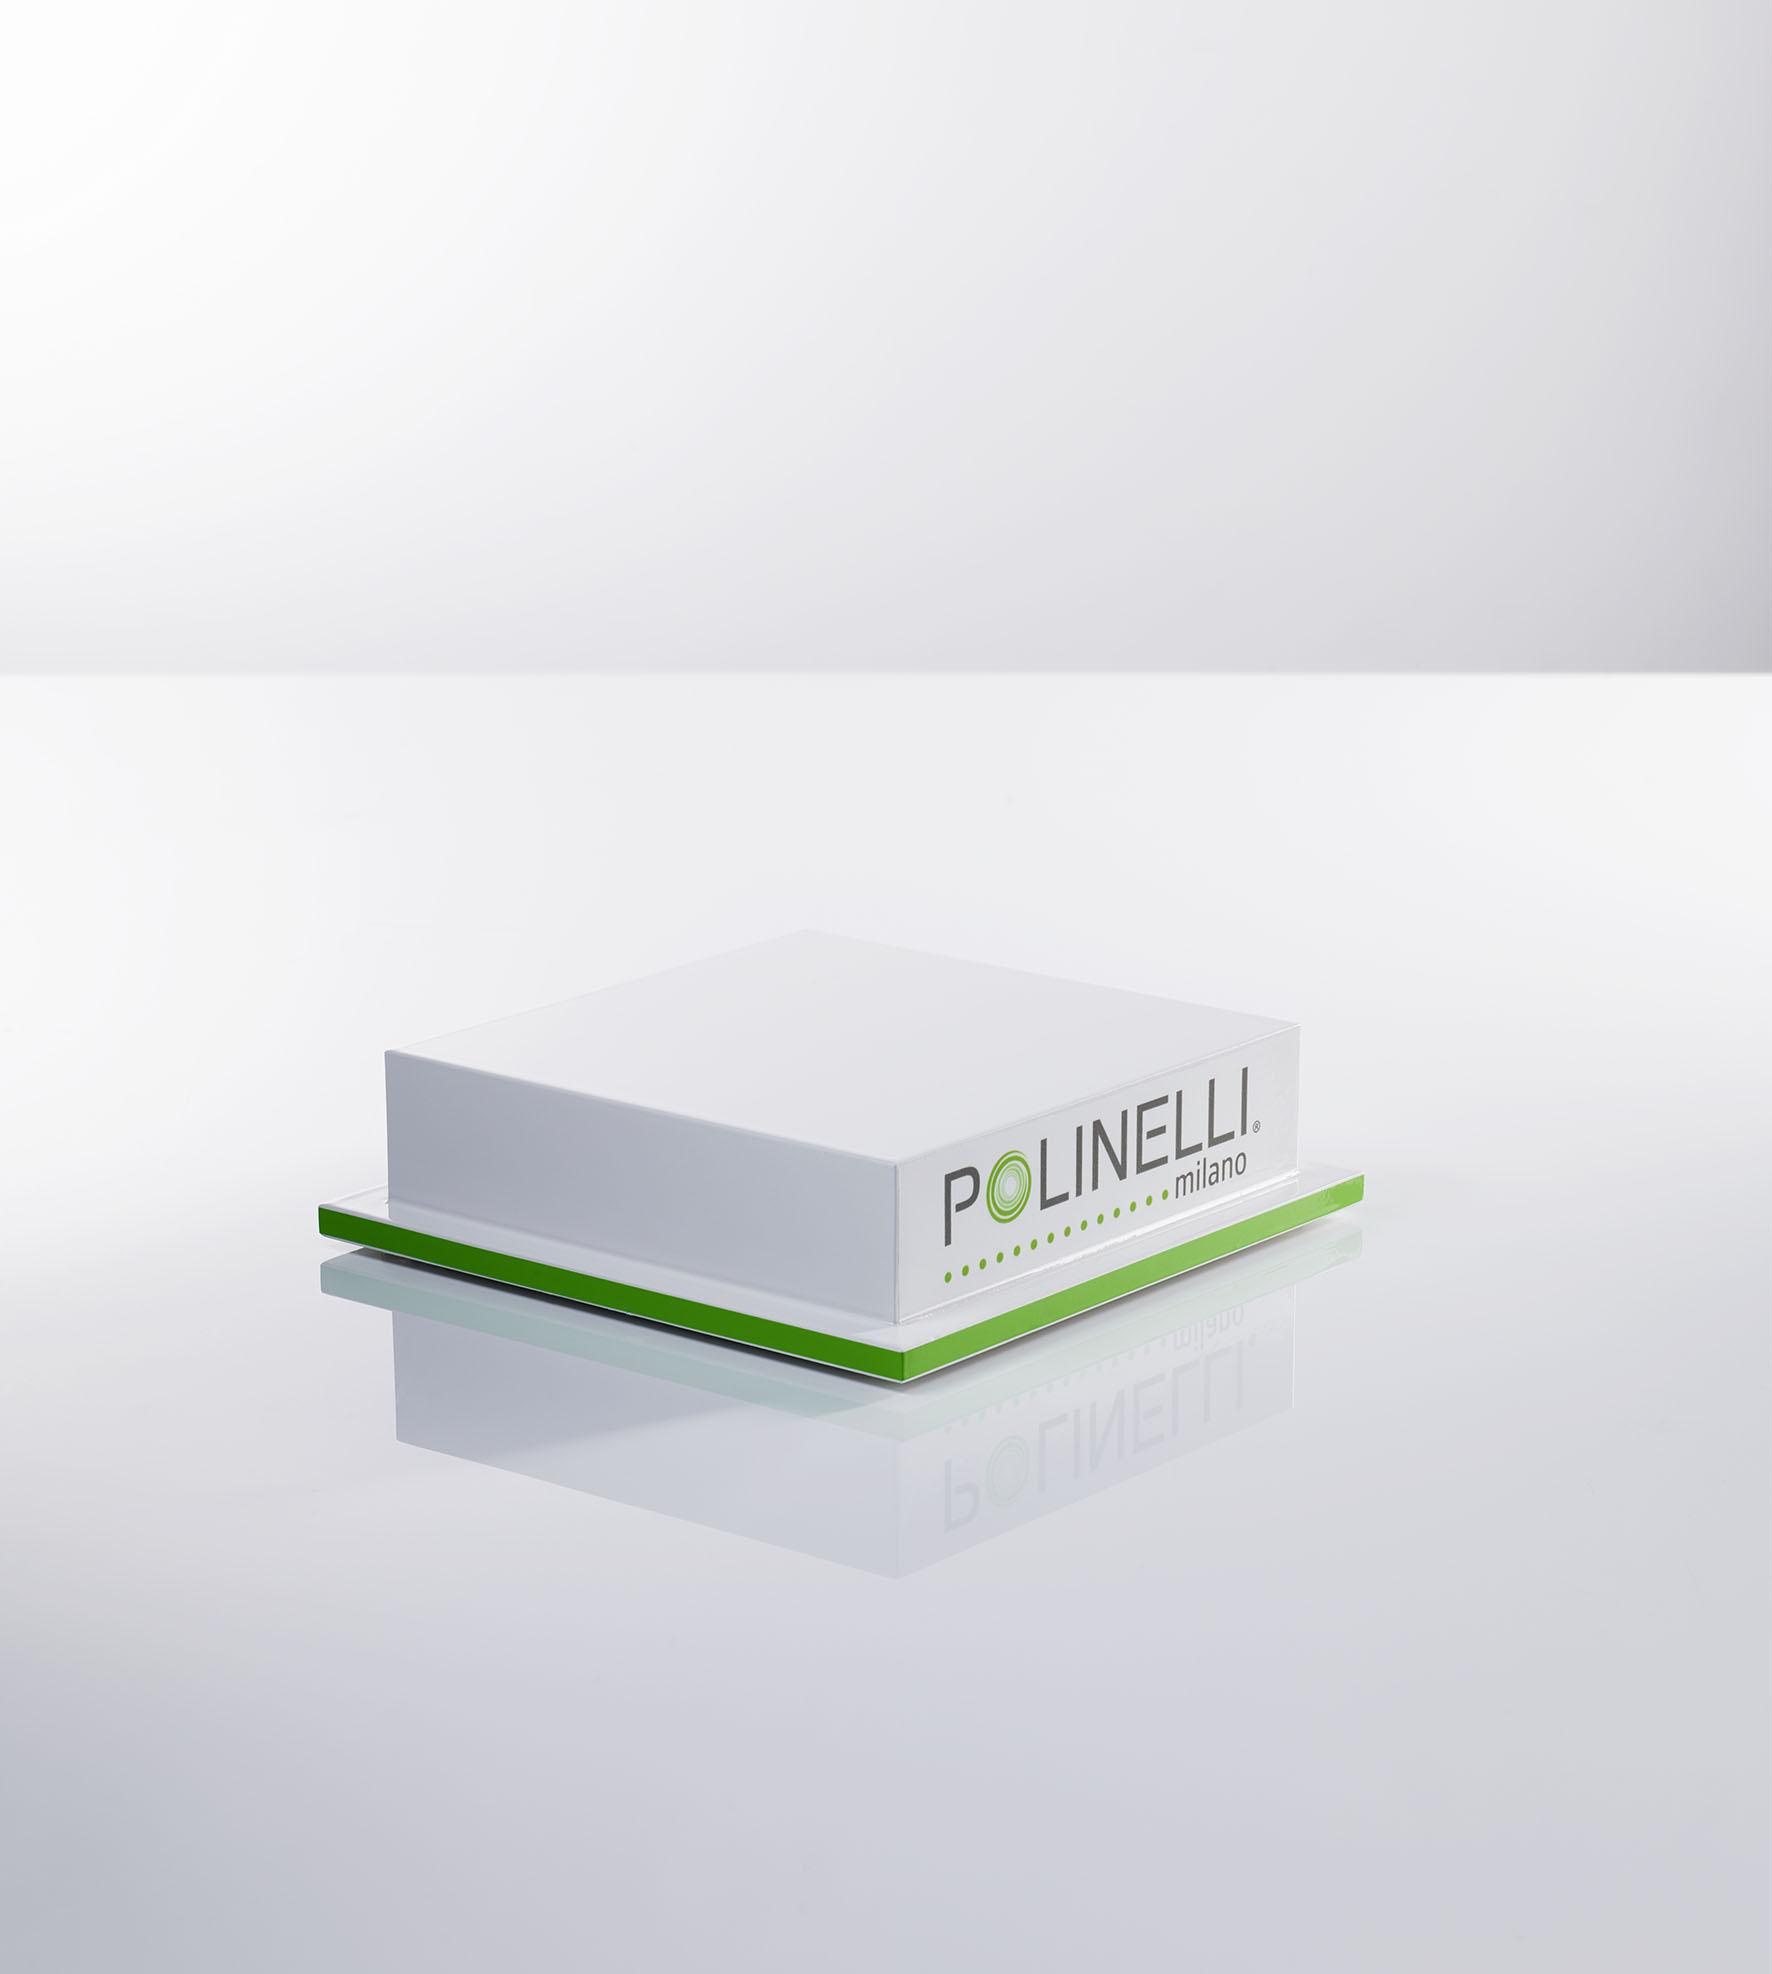 Polinelli Brillendisplays